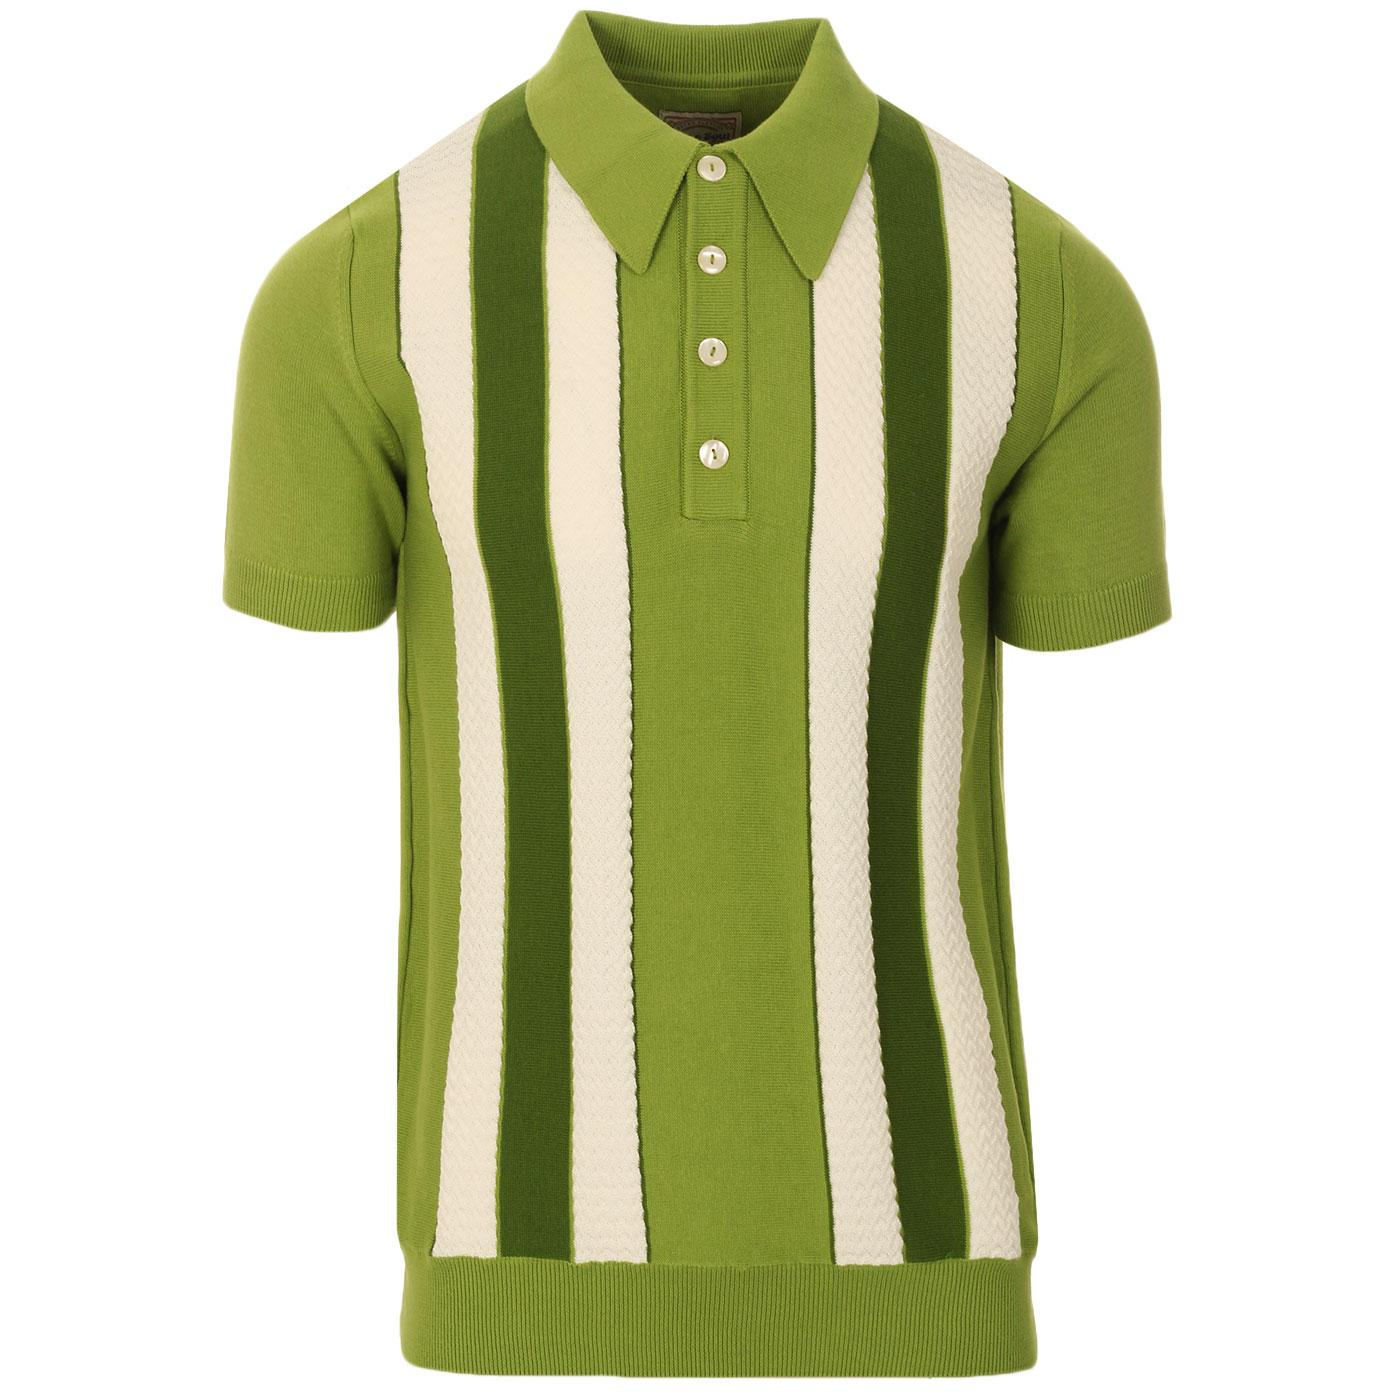 SKA & SOUL Mod Textured Stripe Knit Polo (Green)